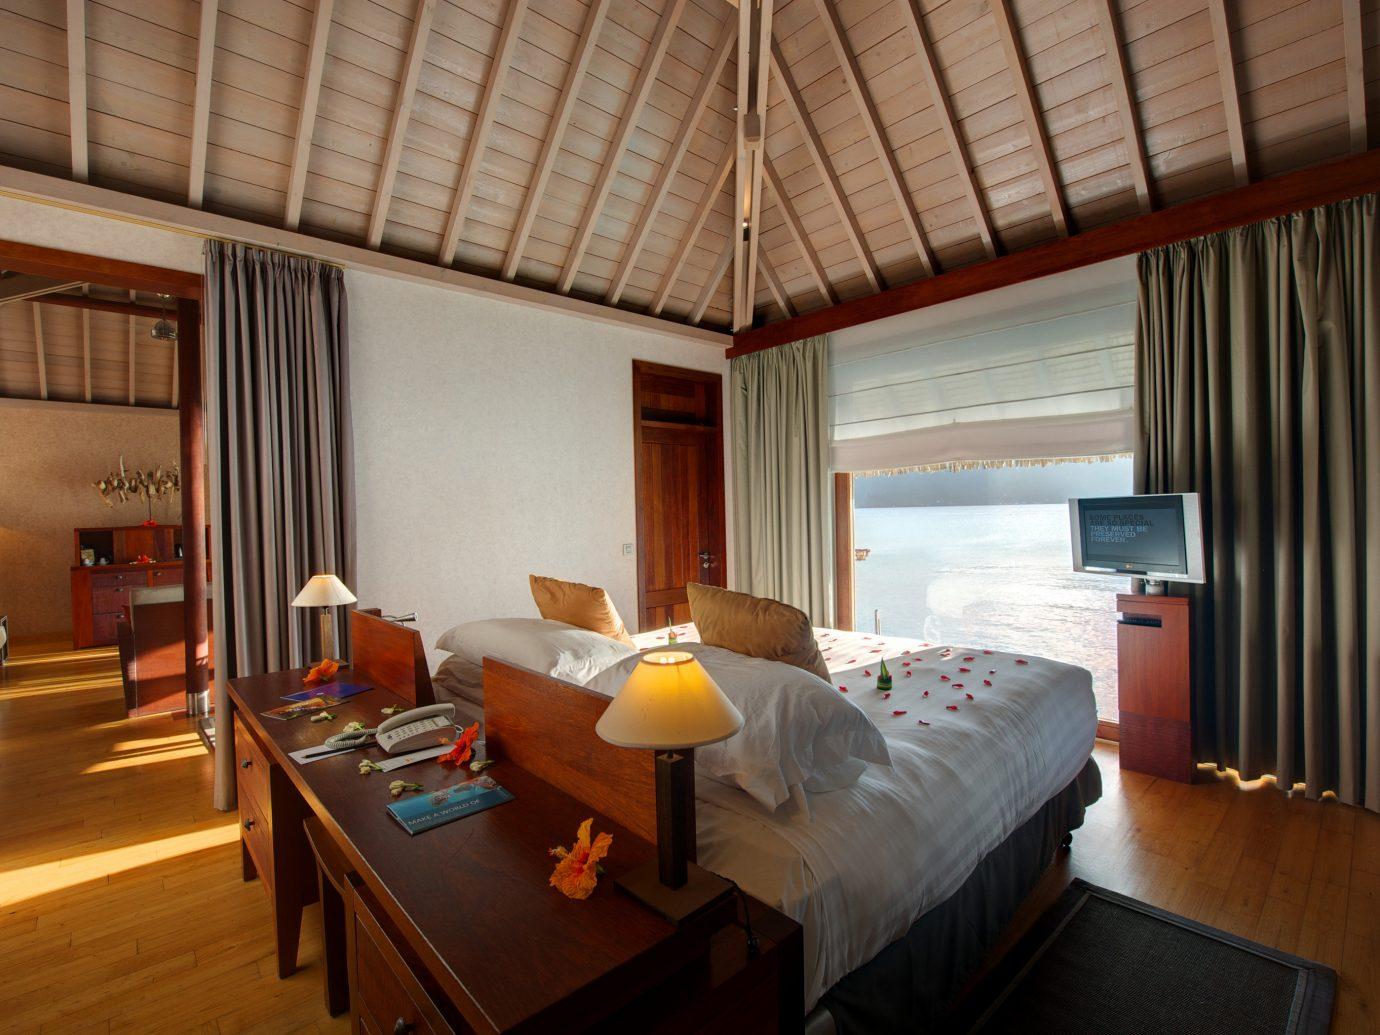 All-Inclusive Resorts Boutique Hotels Hotels Romance indoor floor bed room window Suite interior design Bedroom ceiling hotel real estate boarding house estate furniture